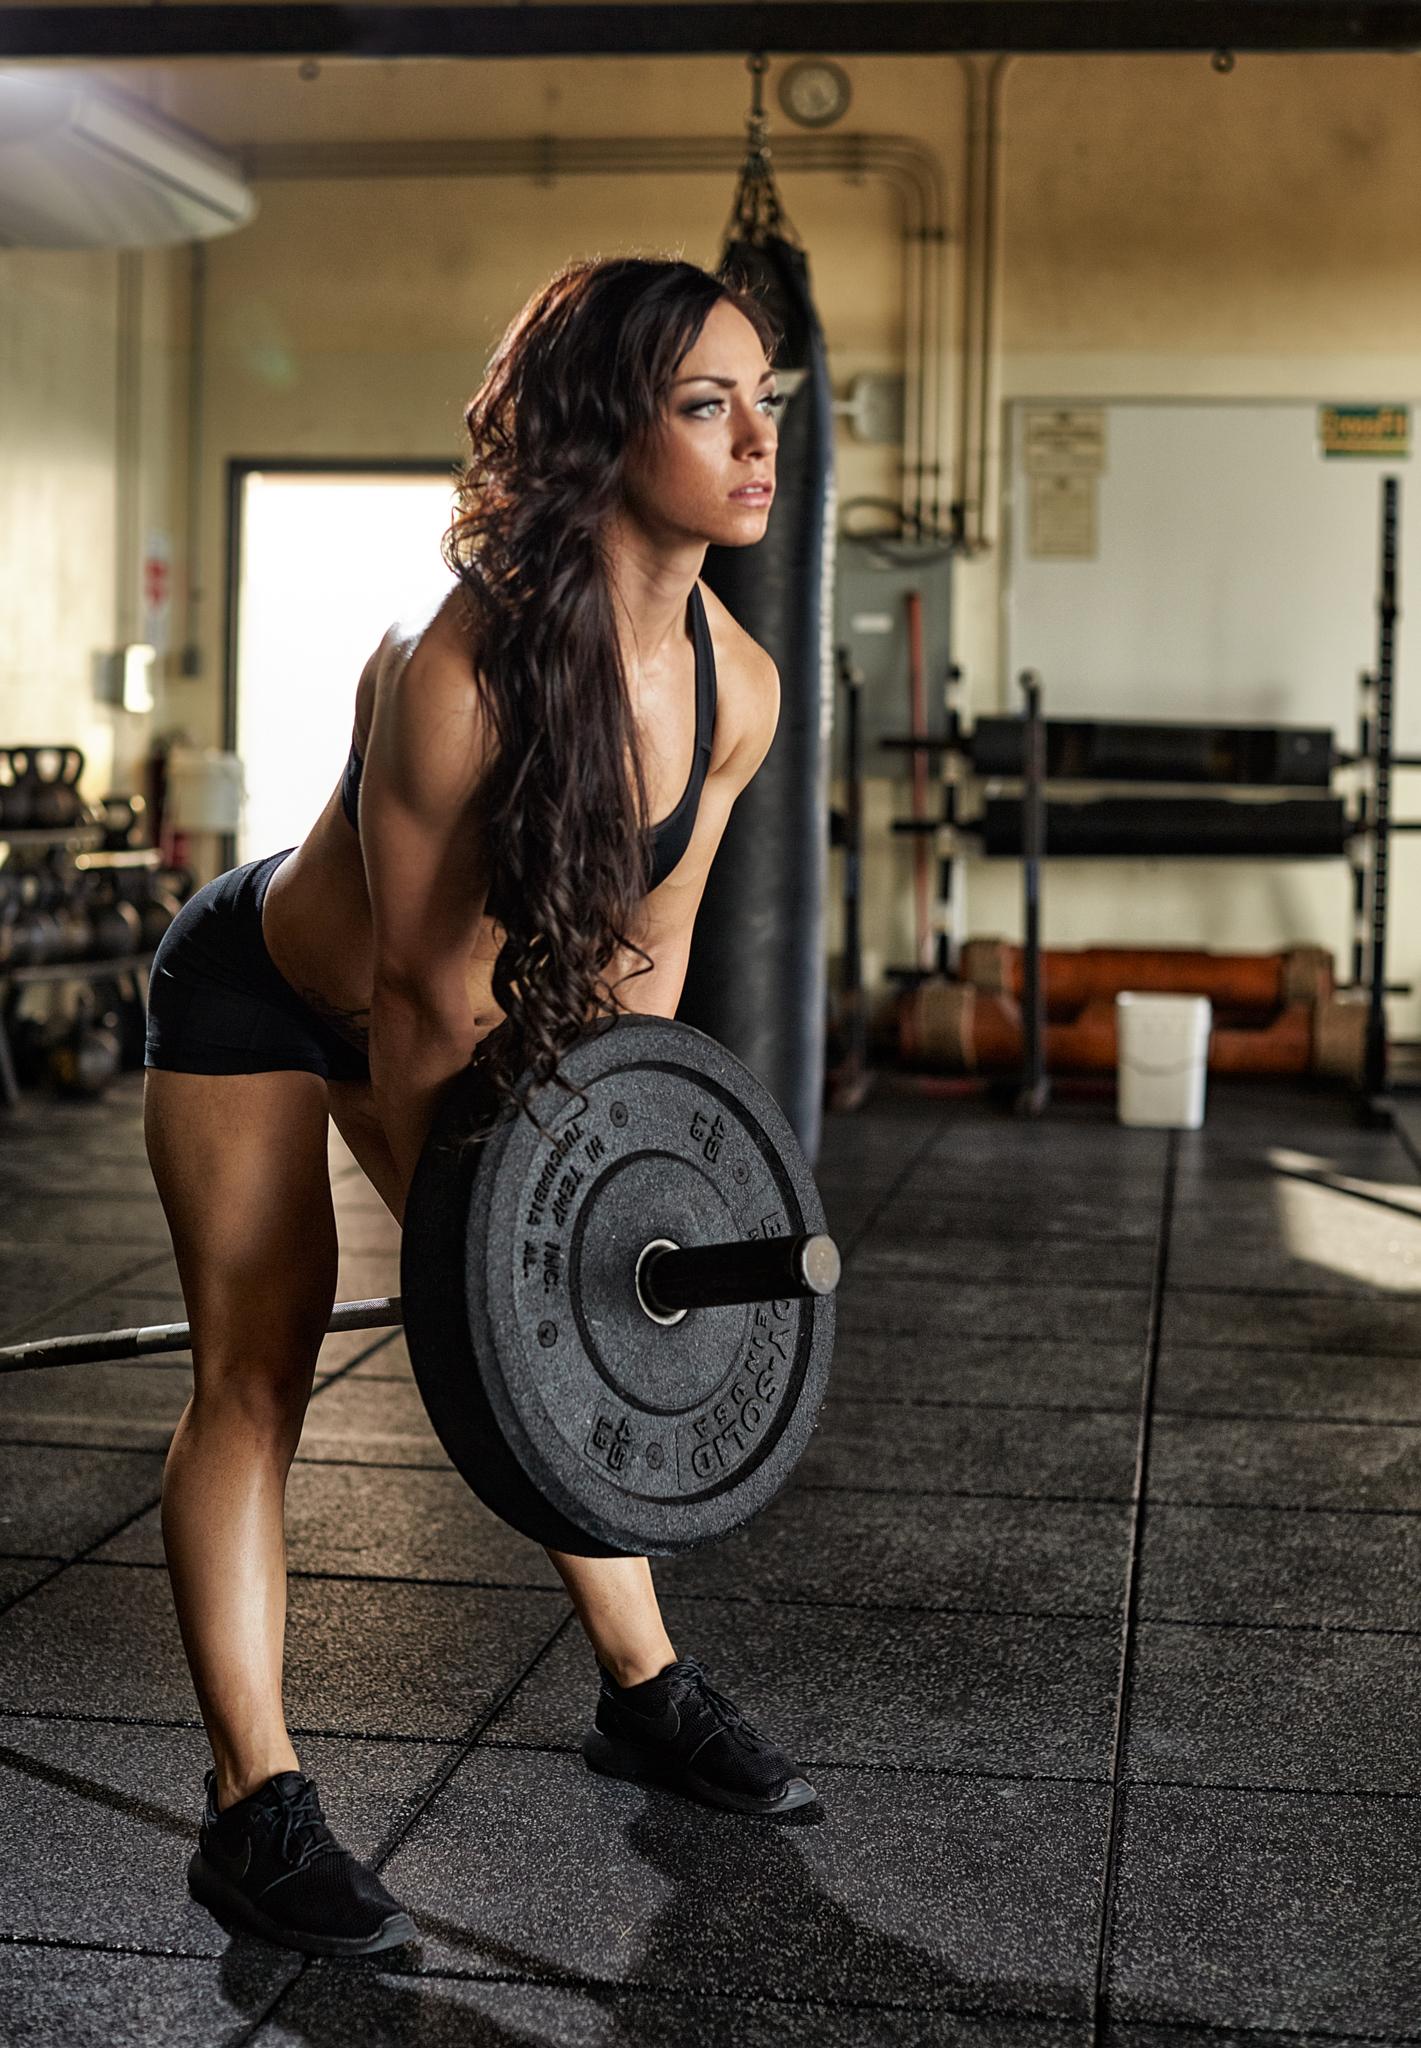 Kayley gym shoot-1563 1.jpg